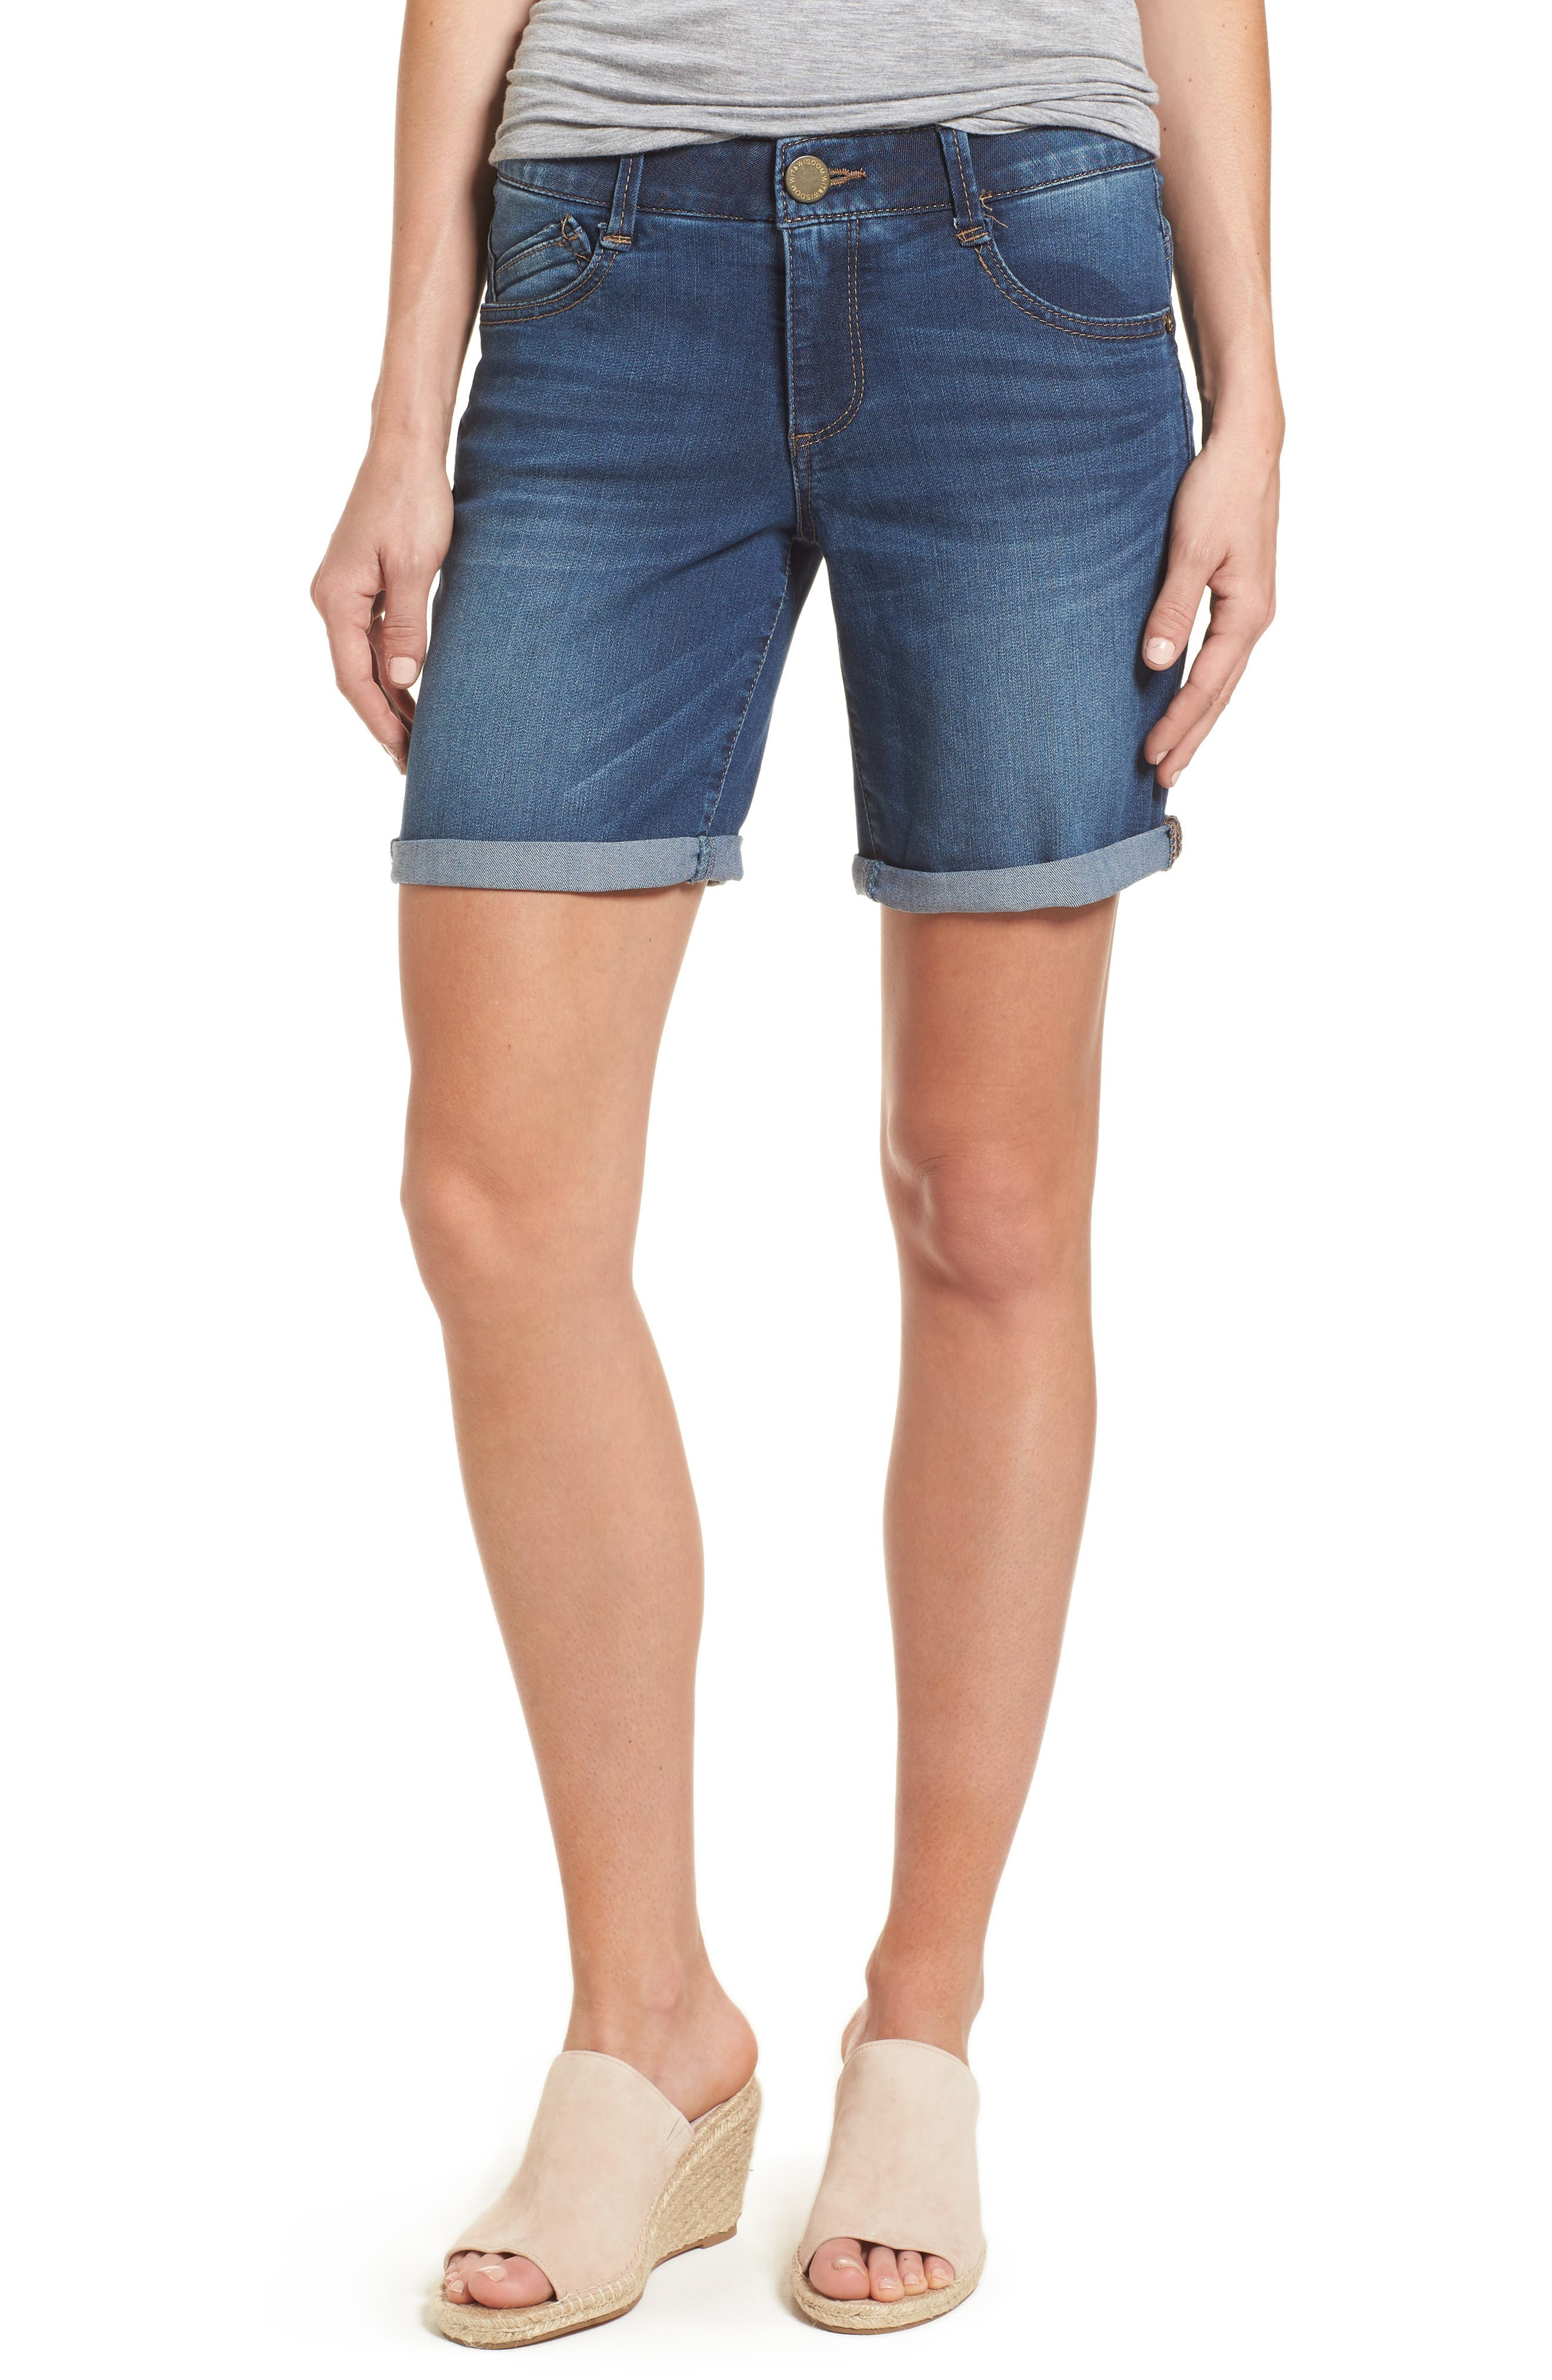 Ab-solution Cuffed Denim Shorts,                         Main,                         color, Blue